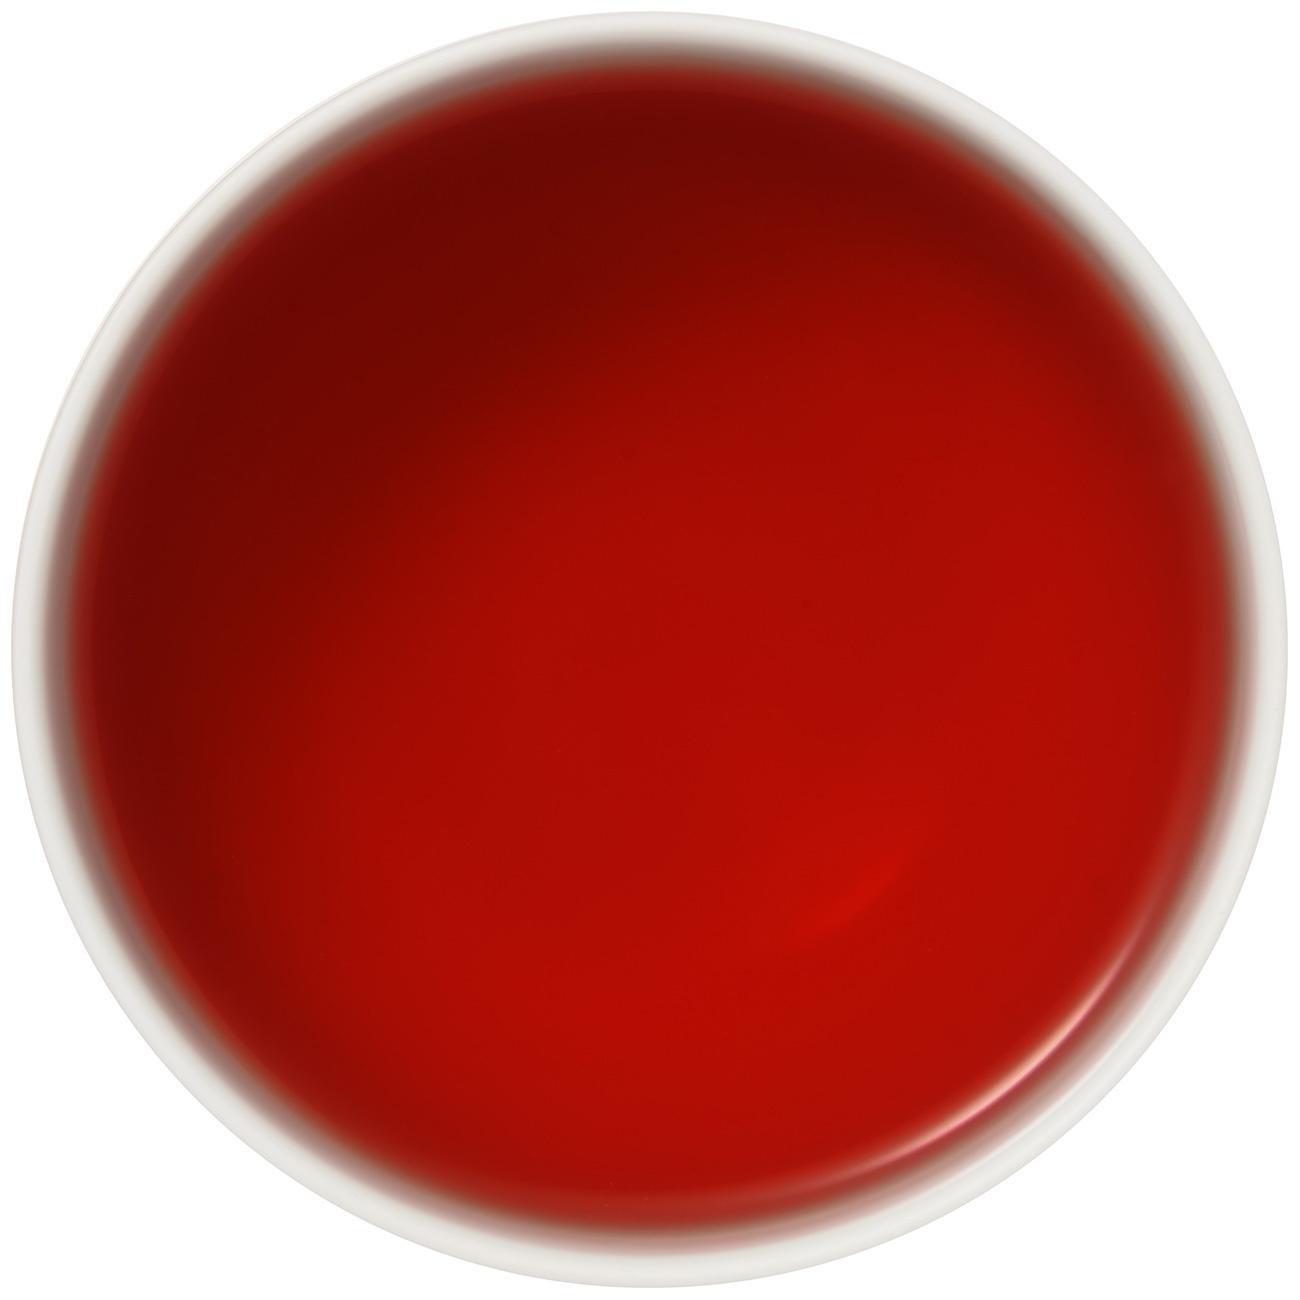 Bloedsinaasappel-3